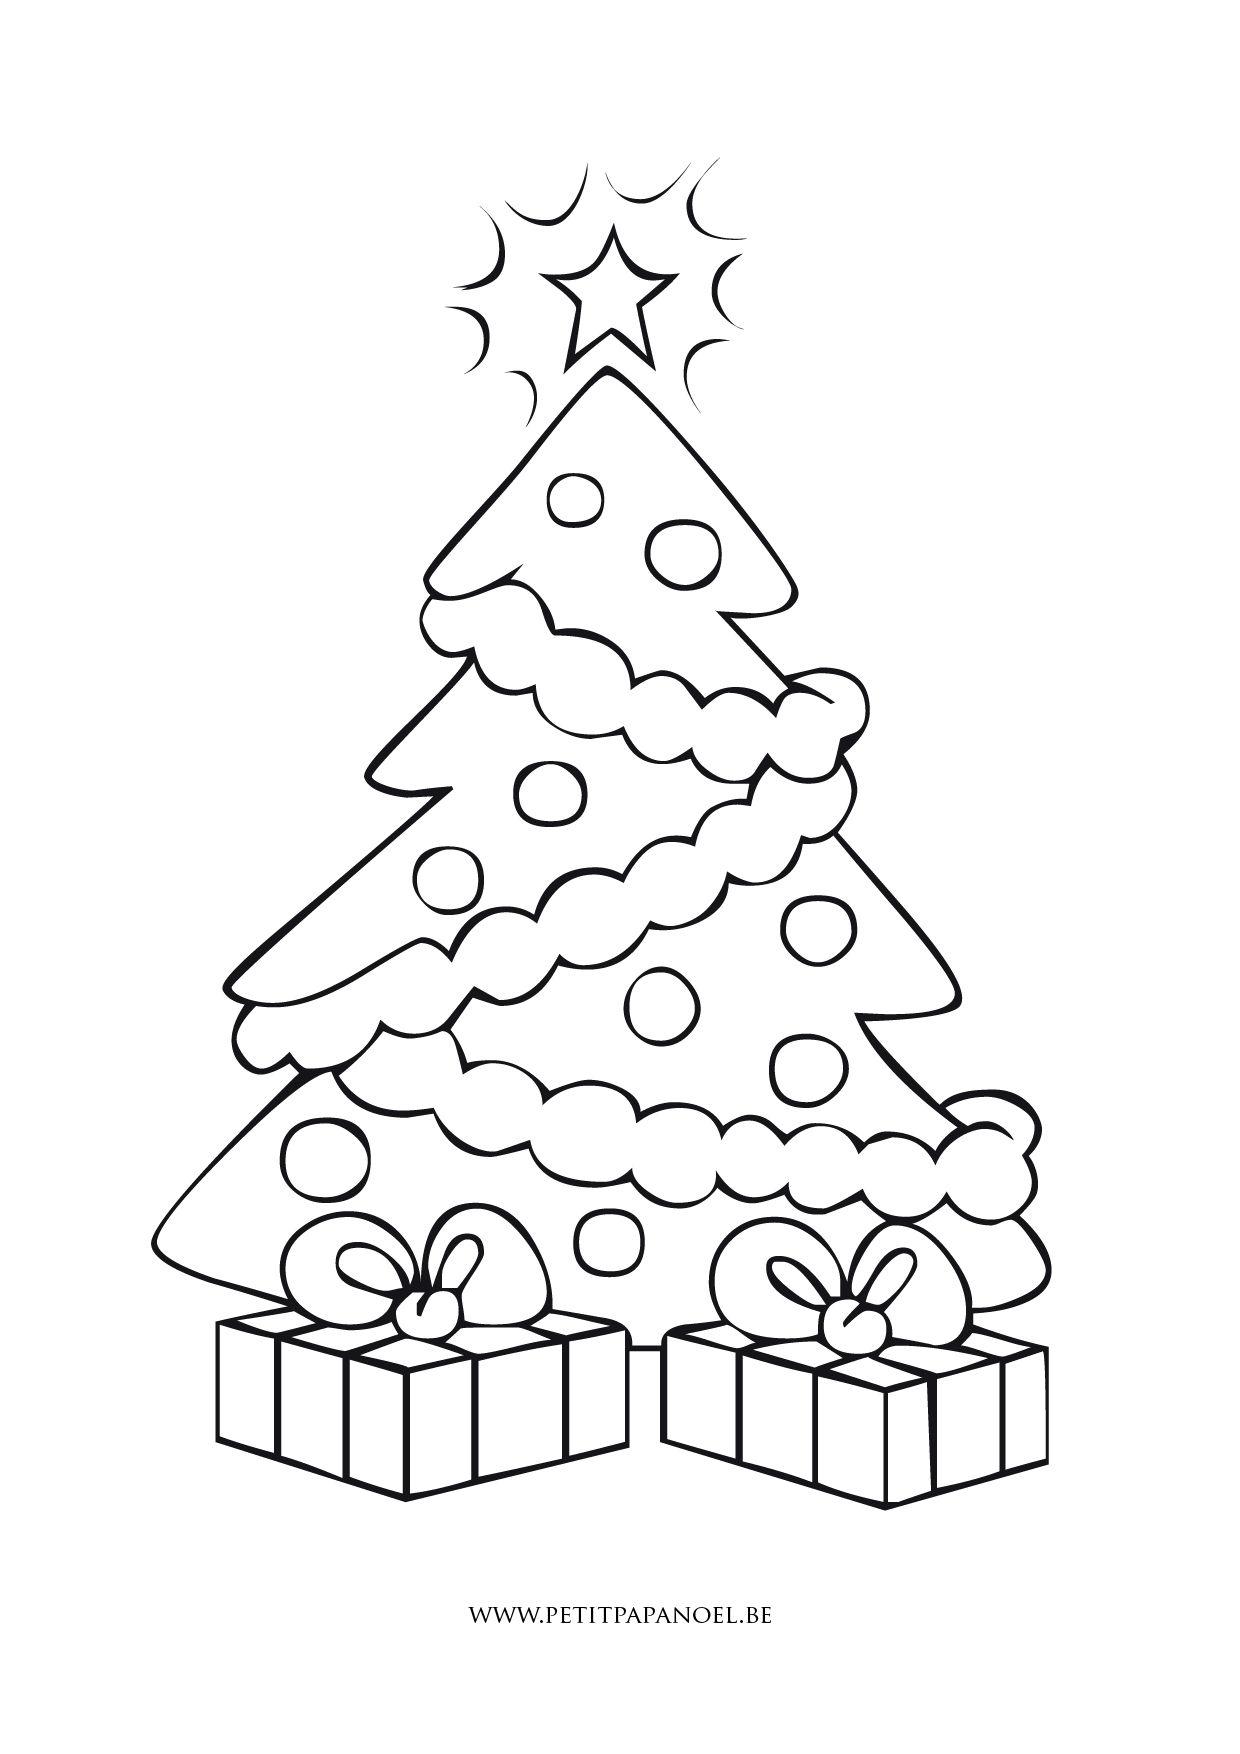 Sapin De Noël | Coloriage Noel Gratuit, Coloriage, Coloriage tout Sapin De Noel A Colorier Gratuit